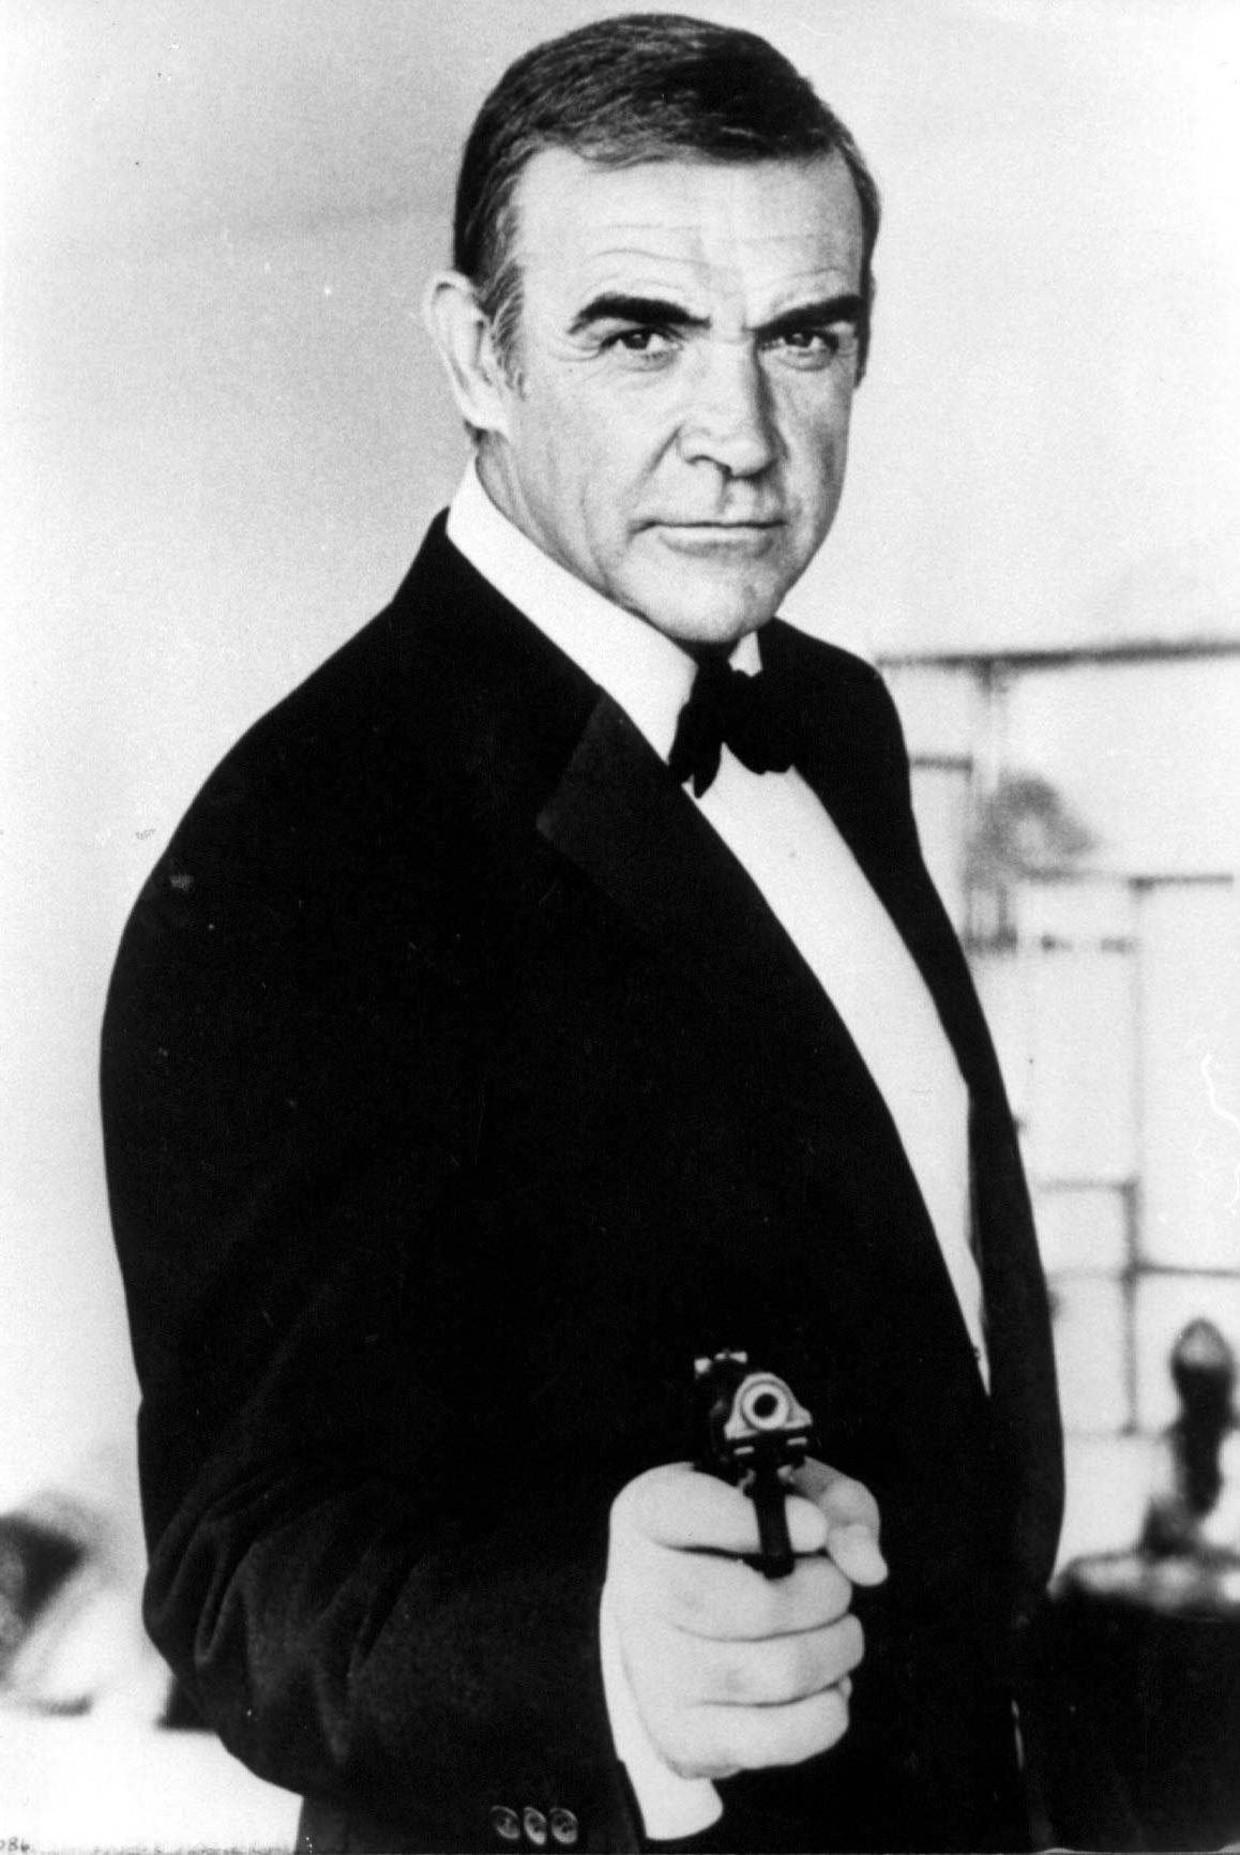 Sean Connery in actie als James Bond. Beeld Photo News